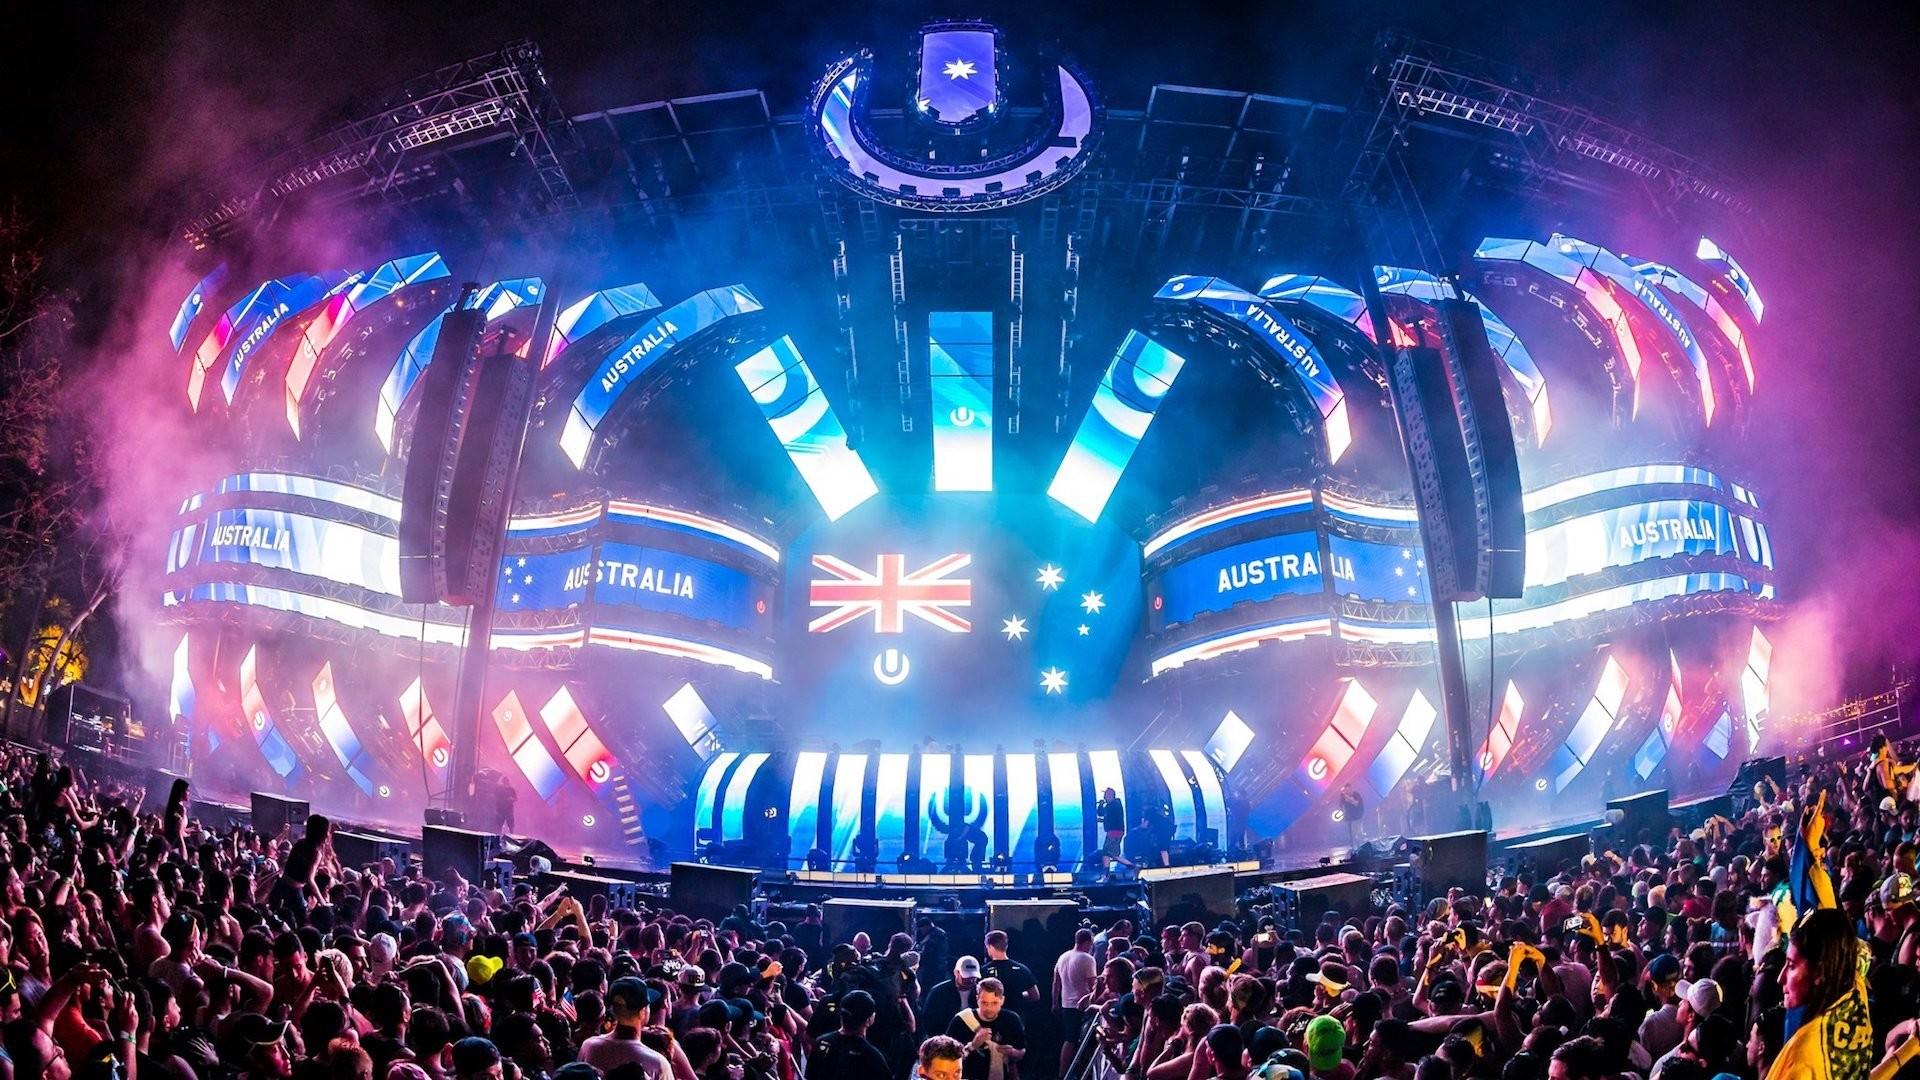 Ultra Music Festival Announces 2018 Australian Date And Venue – Music Feeds